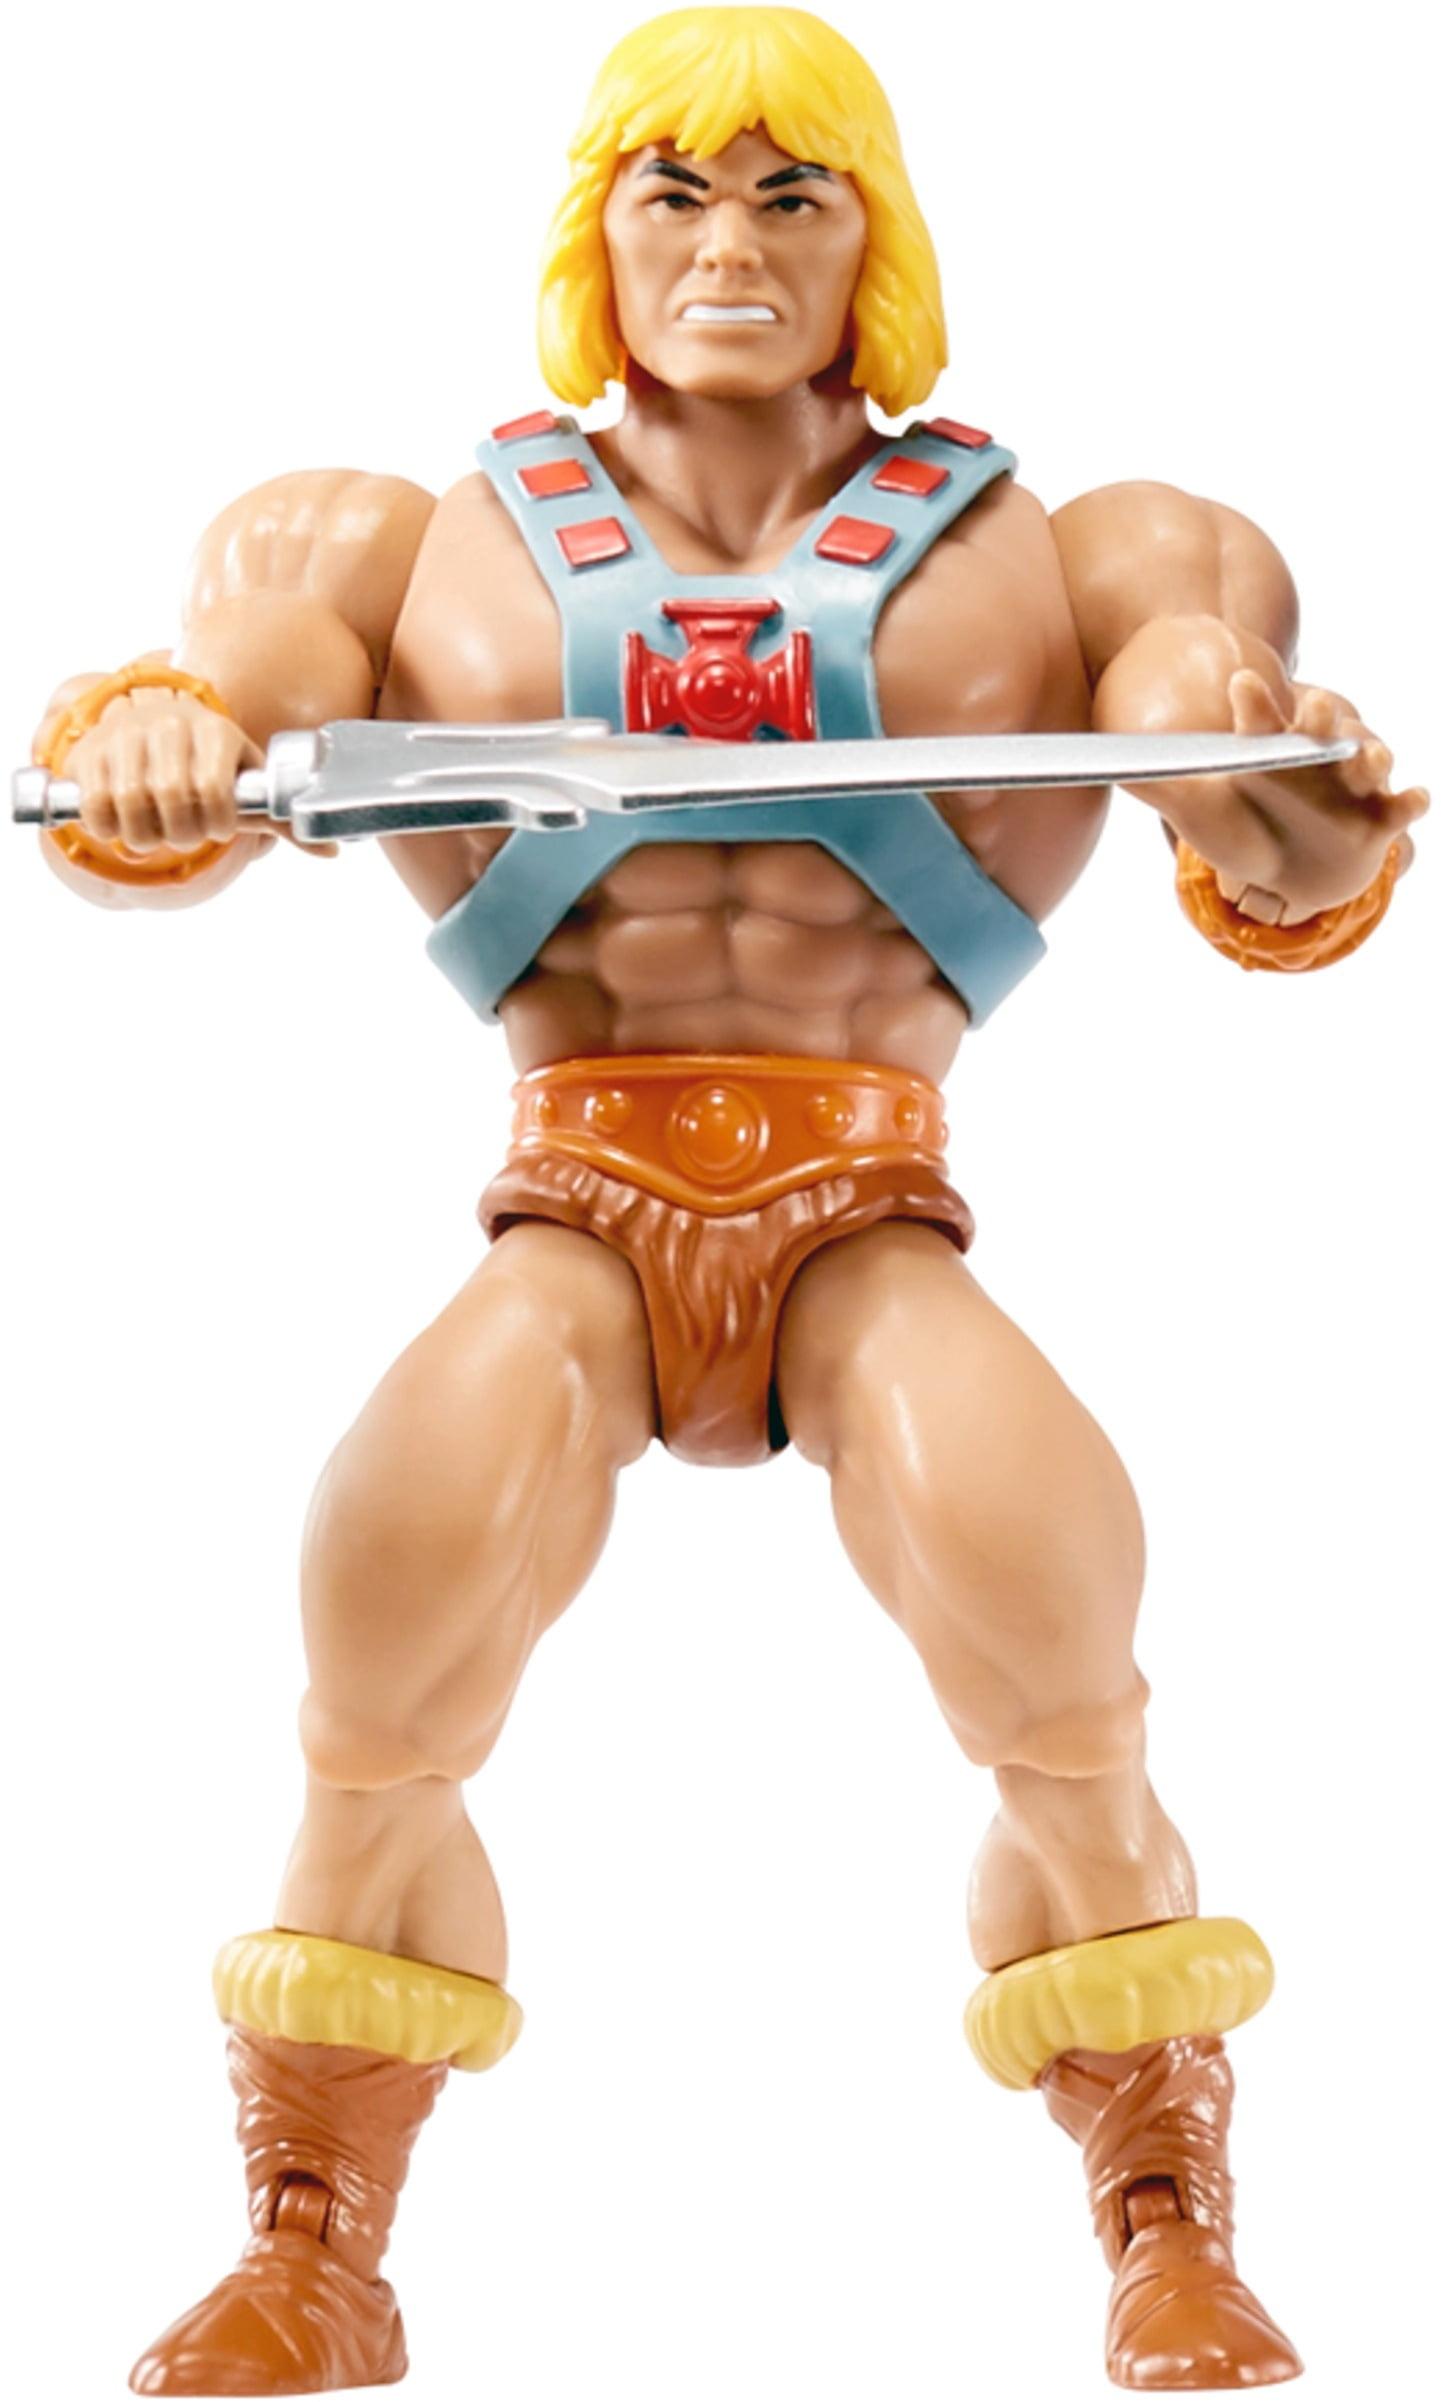 Masters Of The Universe Origins Skeletor 5.5 Action Battle Figure Walmart 2020